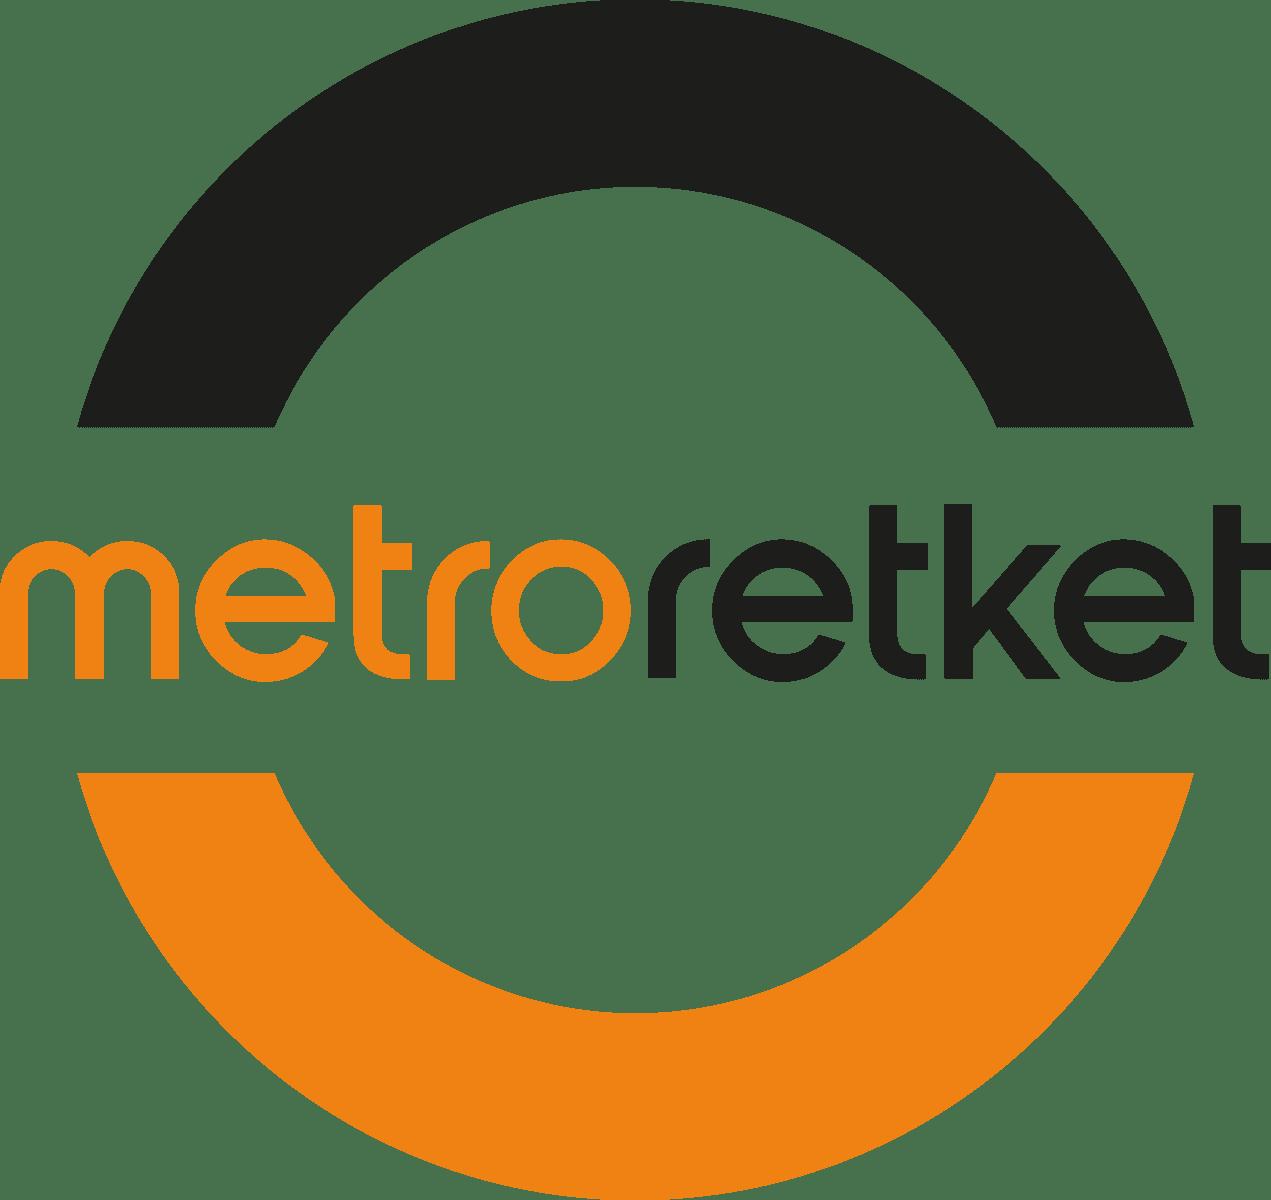 Metroretket logo